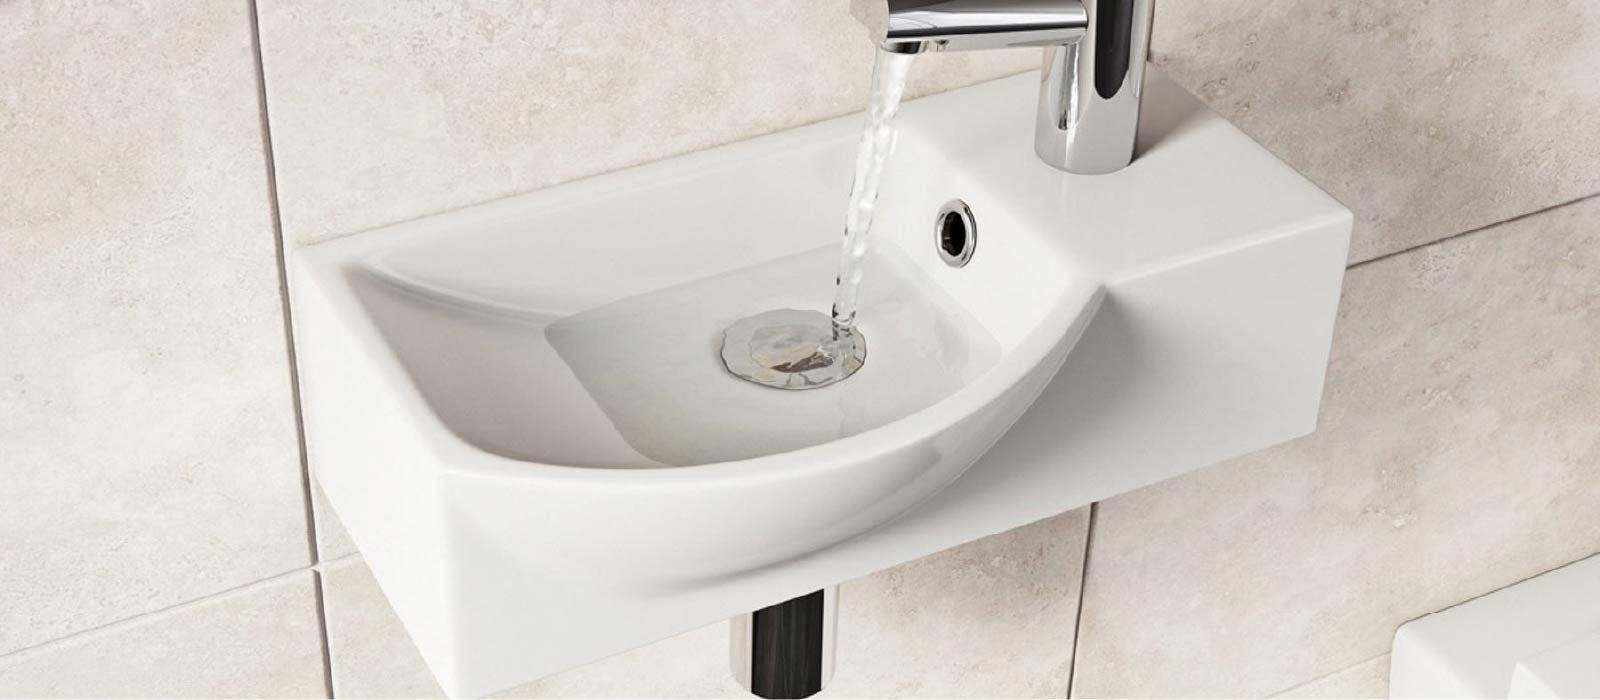 Freshen up with these 7 beautiful wash basin ideas